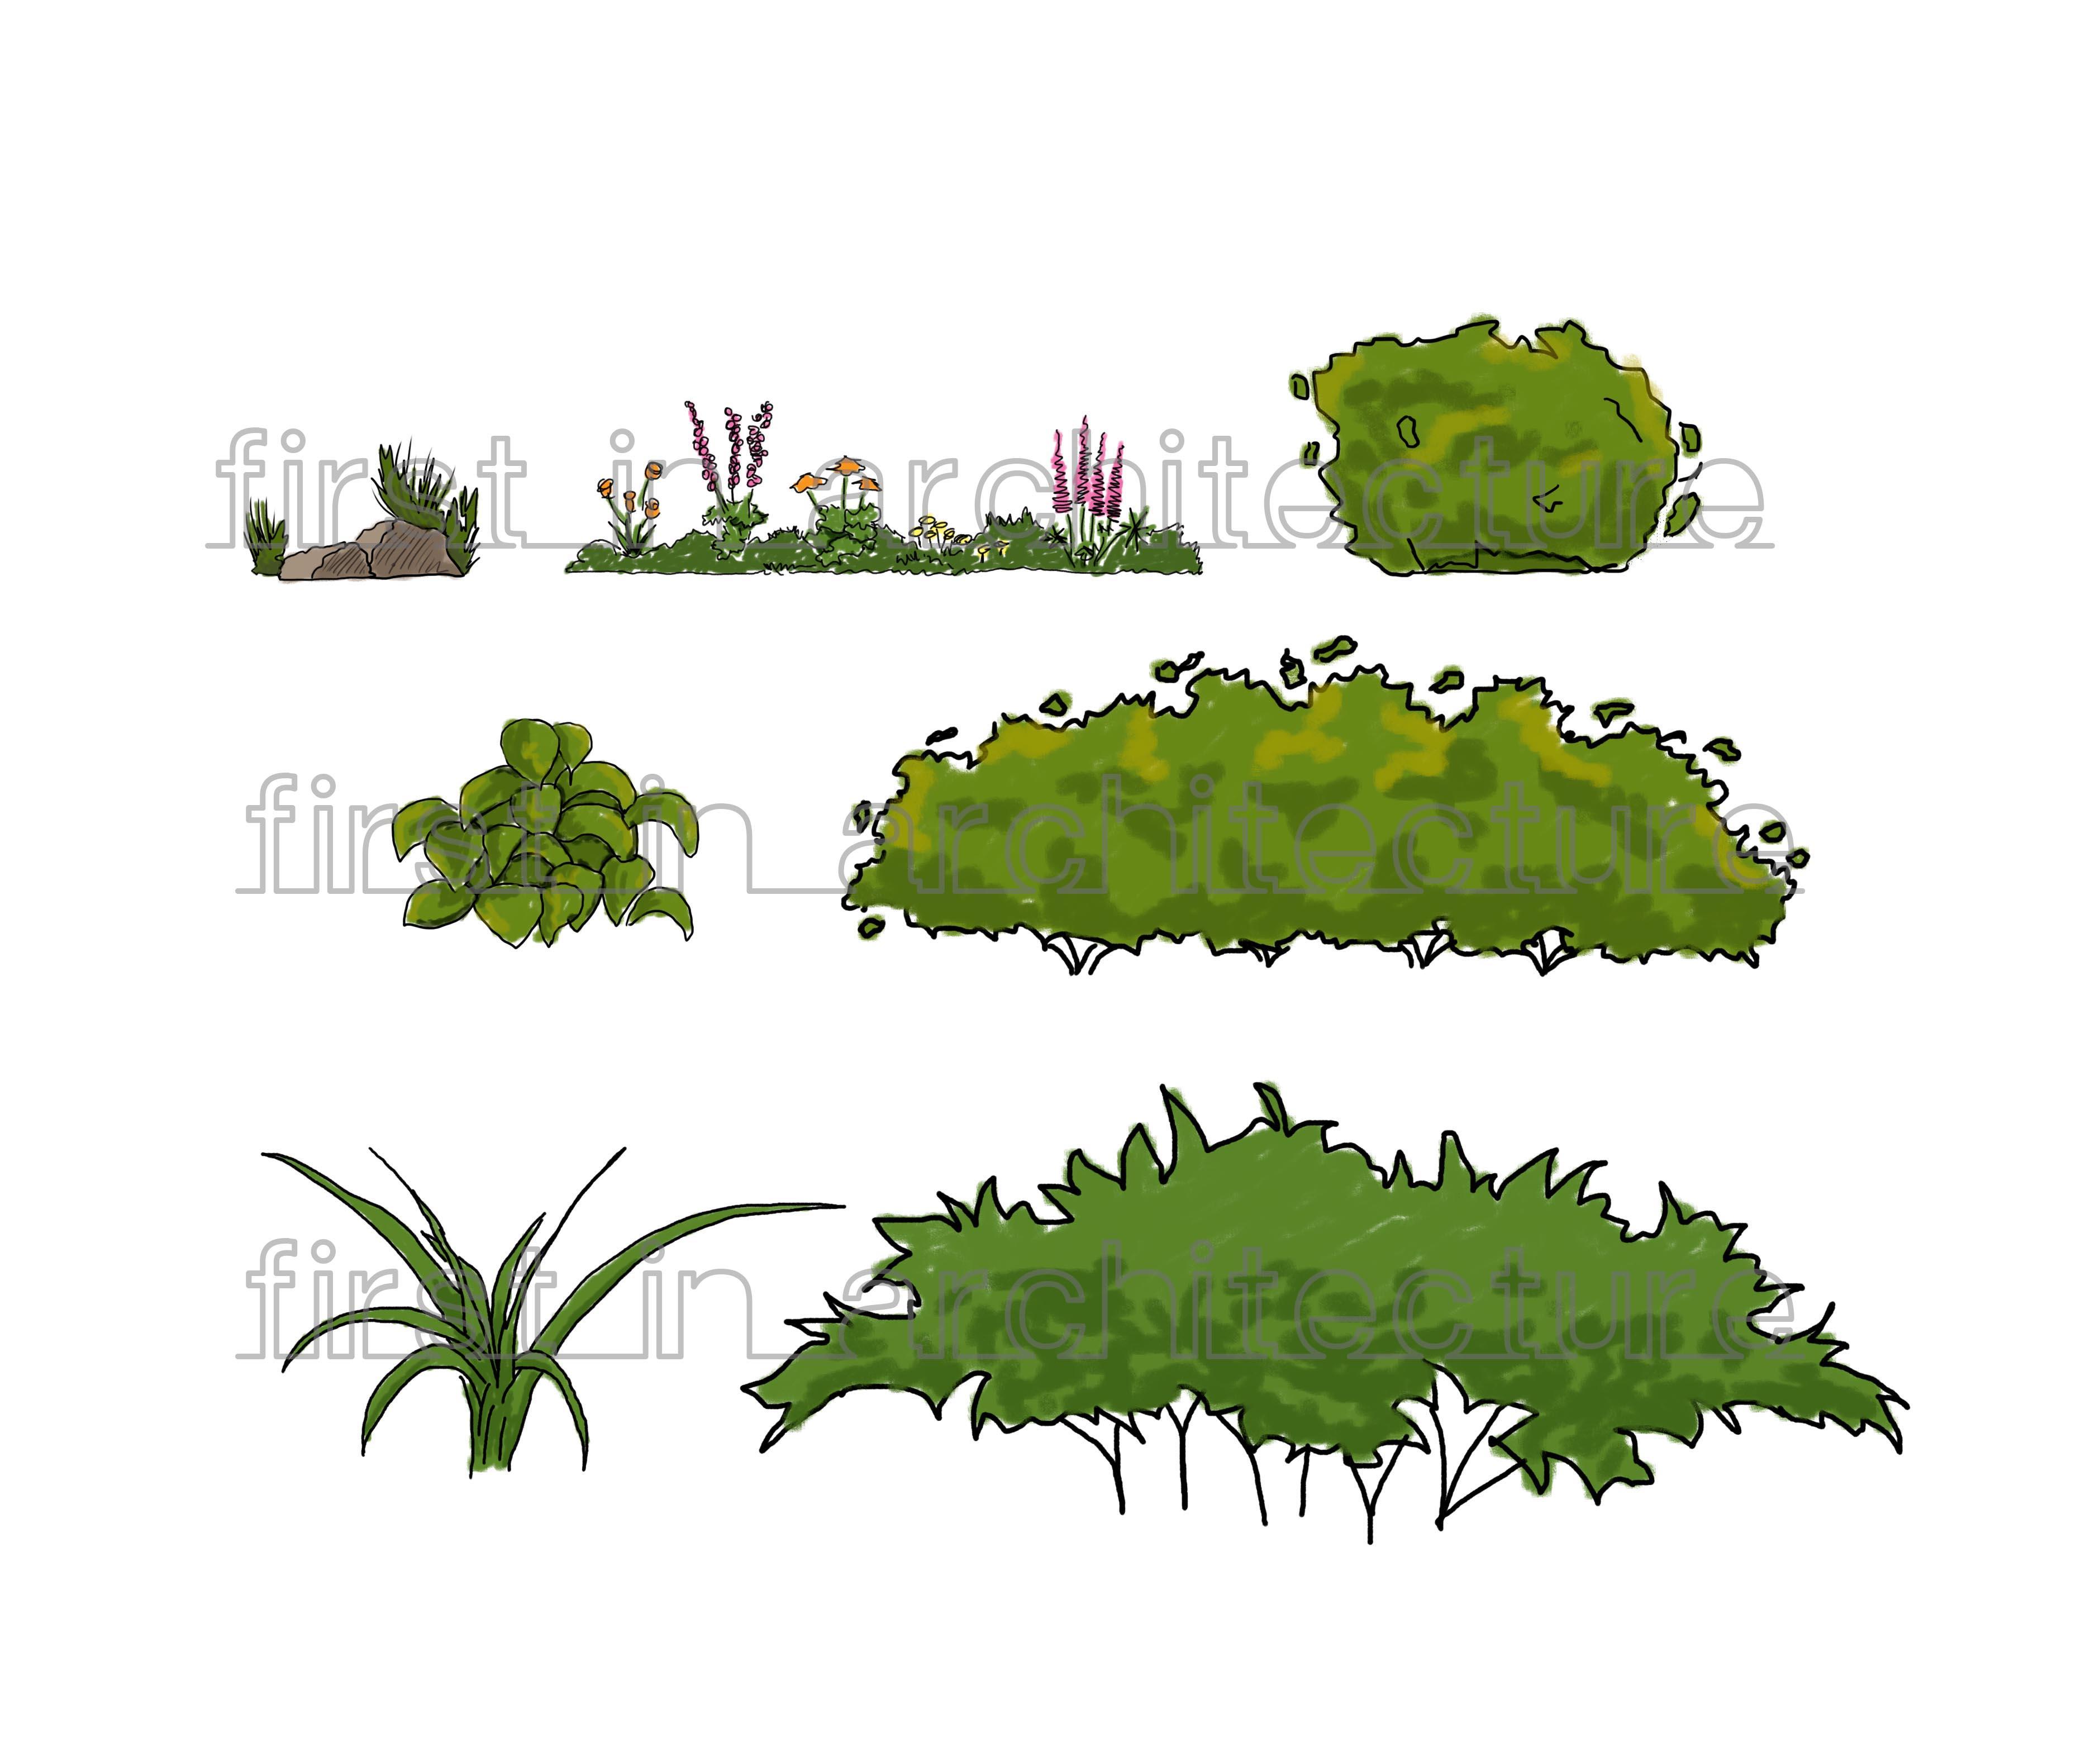 Drawn shrub Everything Design plants shrubs &